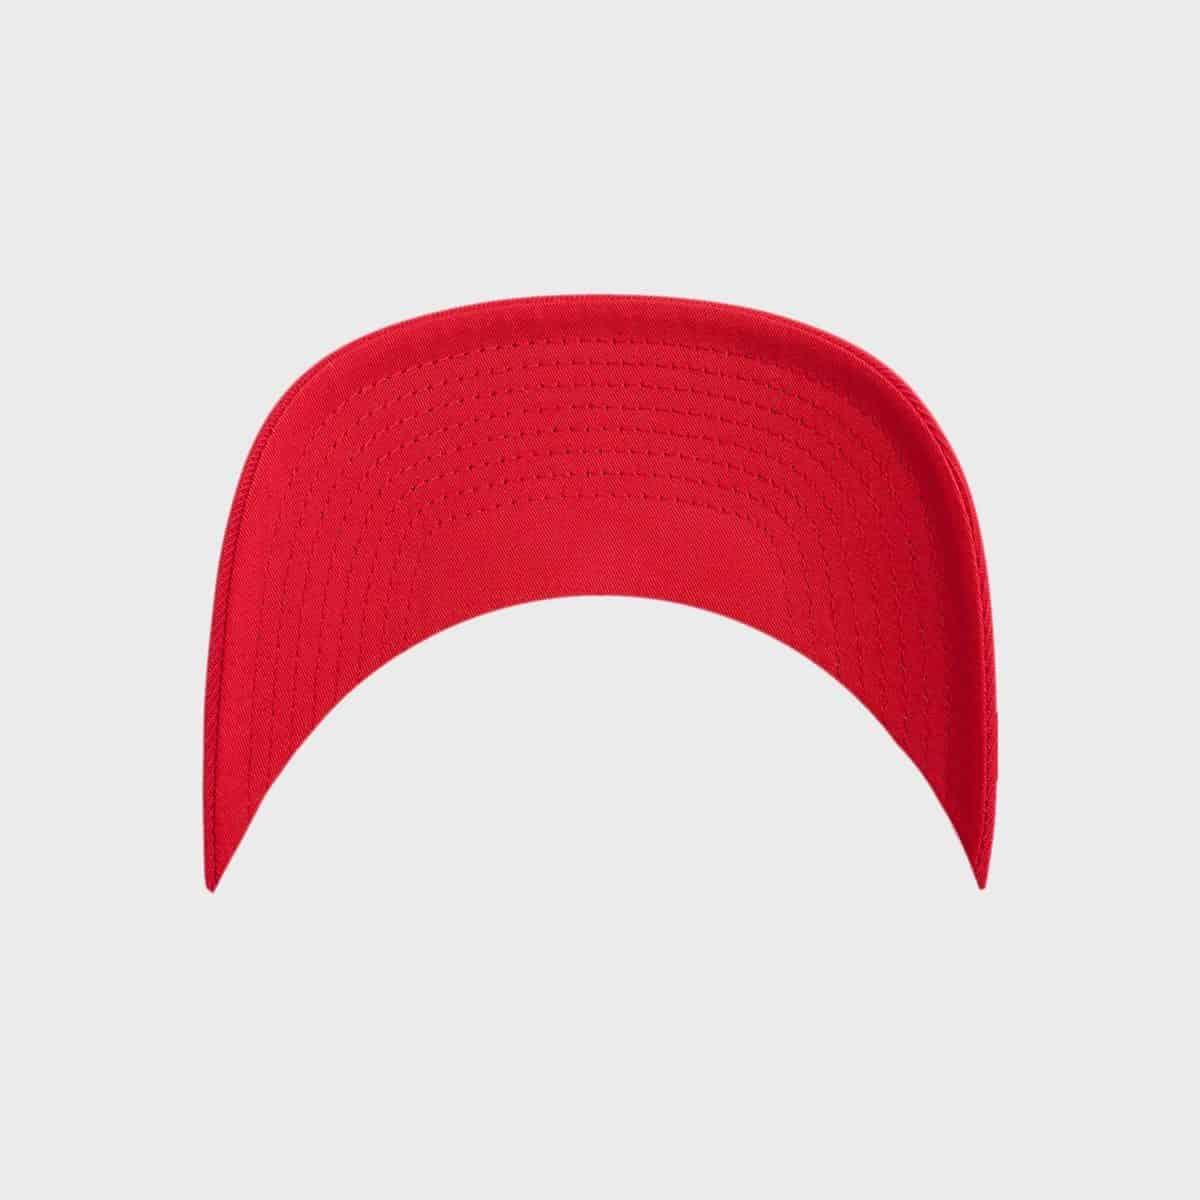 Flexfit FlexfitCaps FFE 6533 Red Schirm